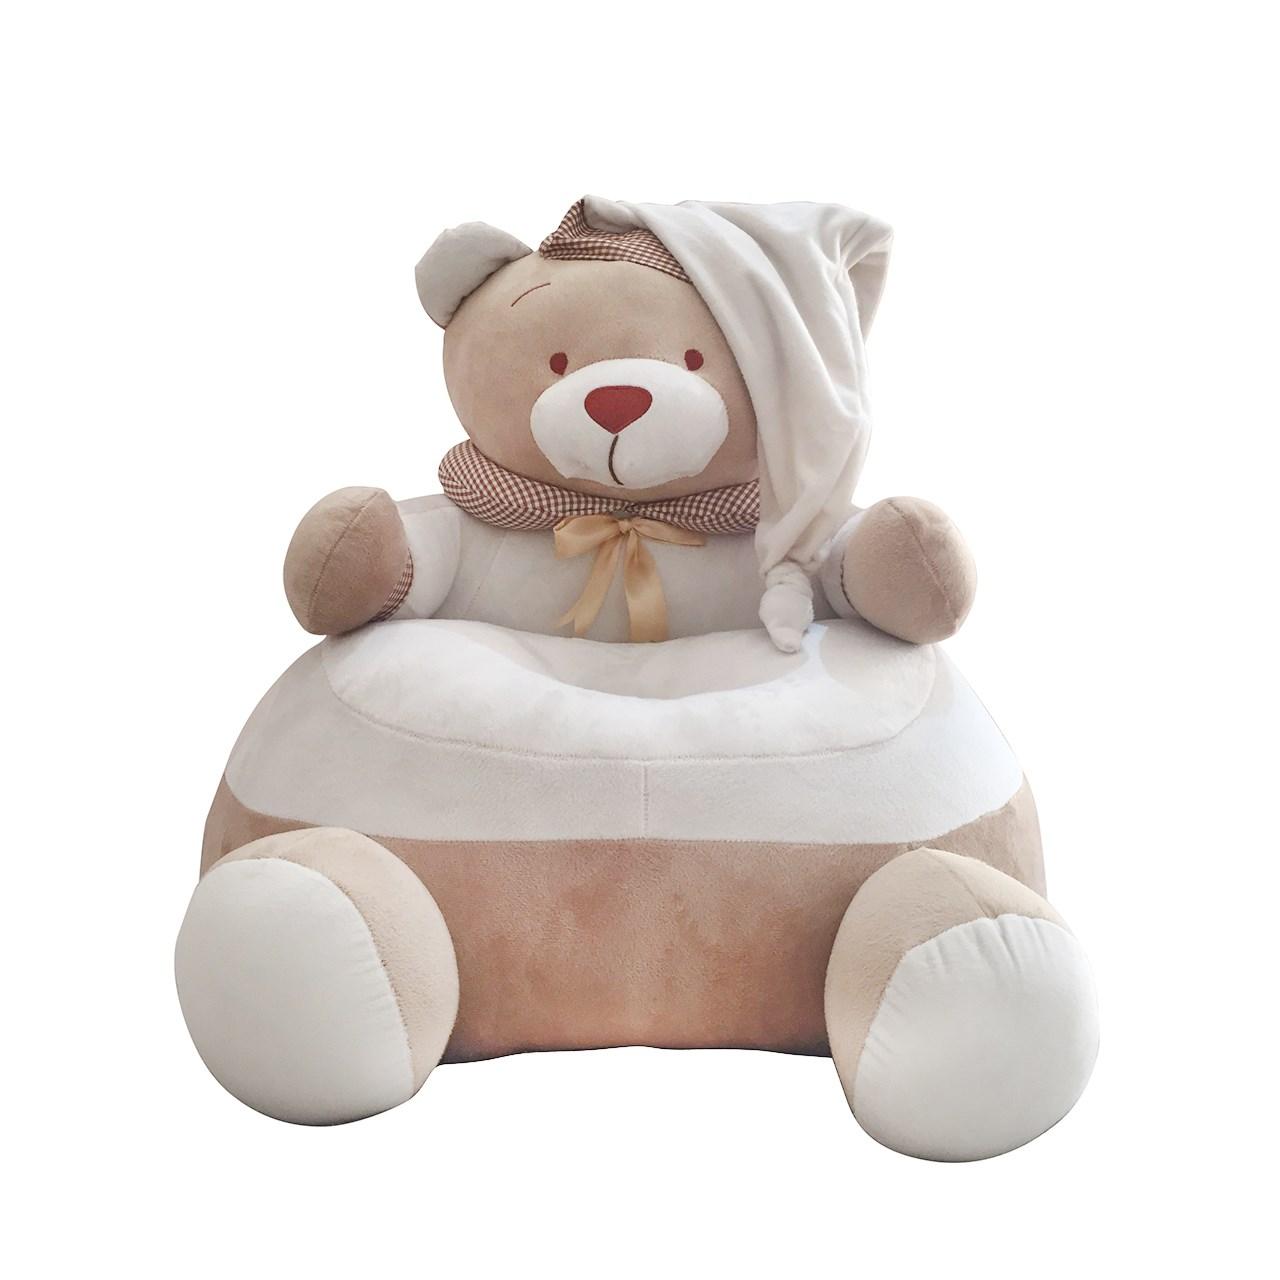 مبل خرسی کودک مدل تدی T02